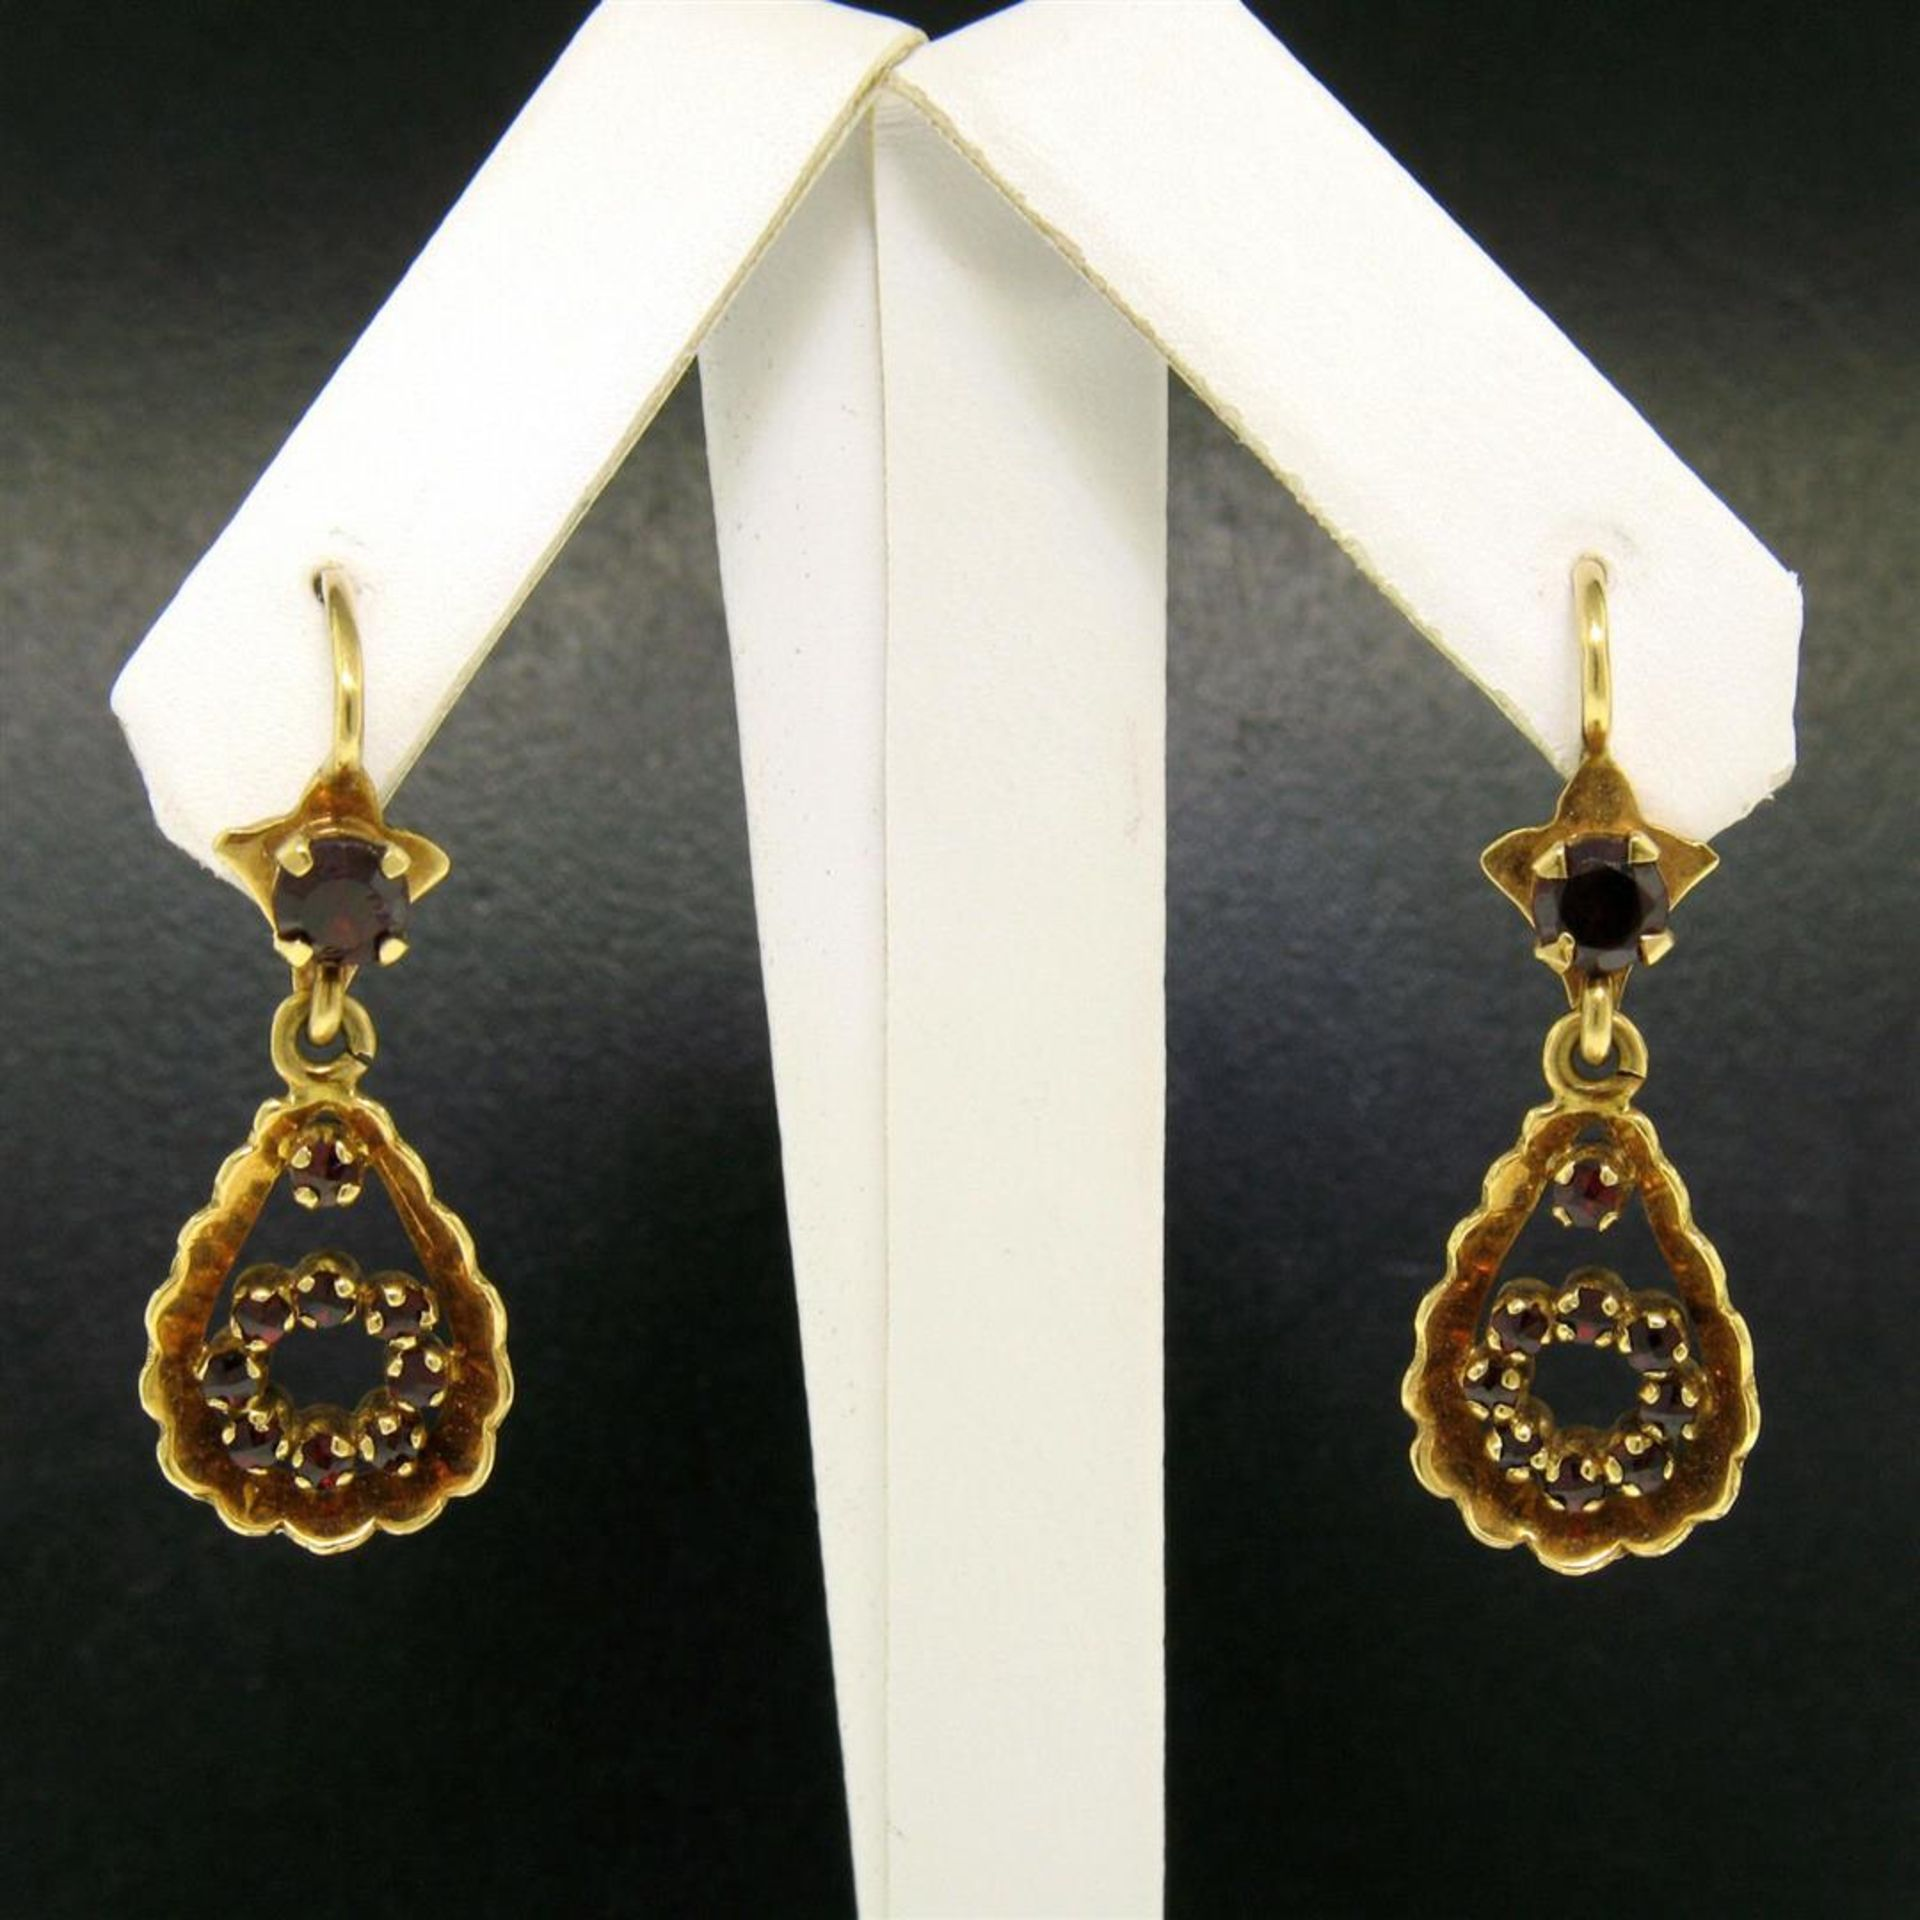 Vintage 18K Yellow Gold 1.0 ctw Pear Shape Garnet Dangle Drop Lever Back Earring - Image 3 of 8